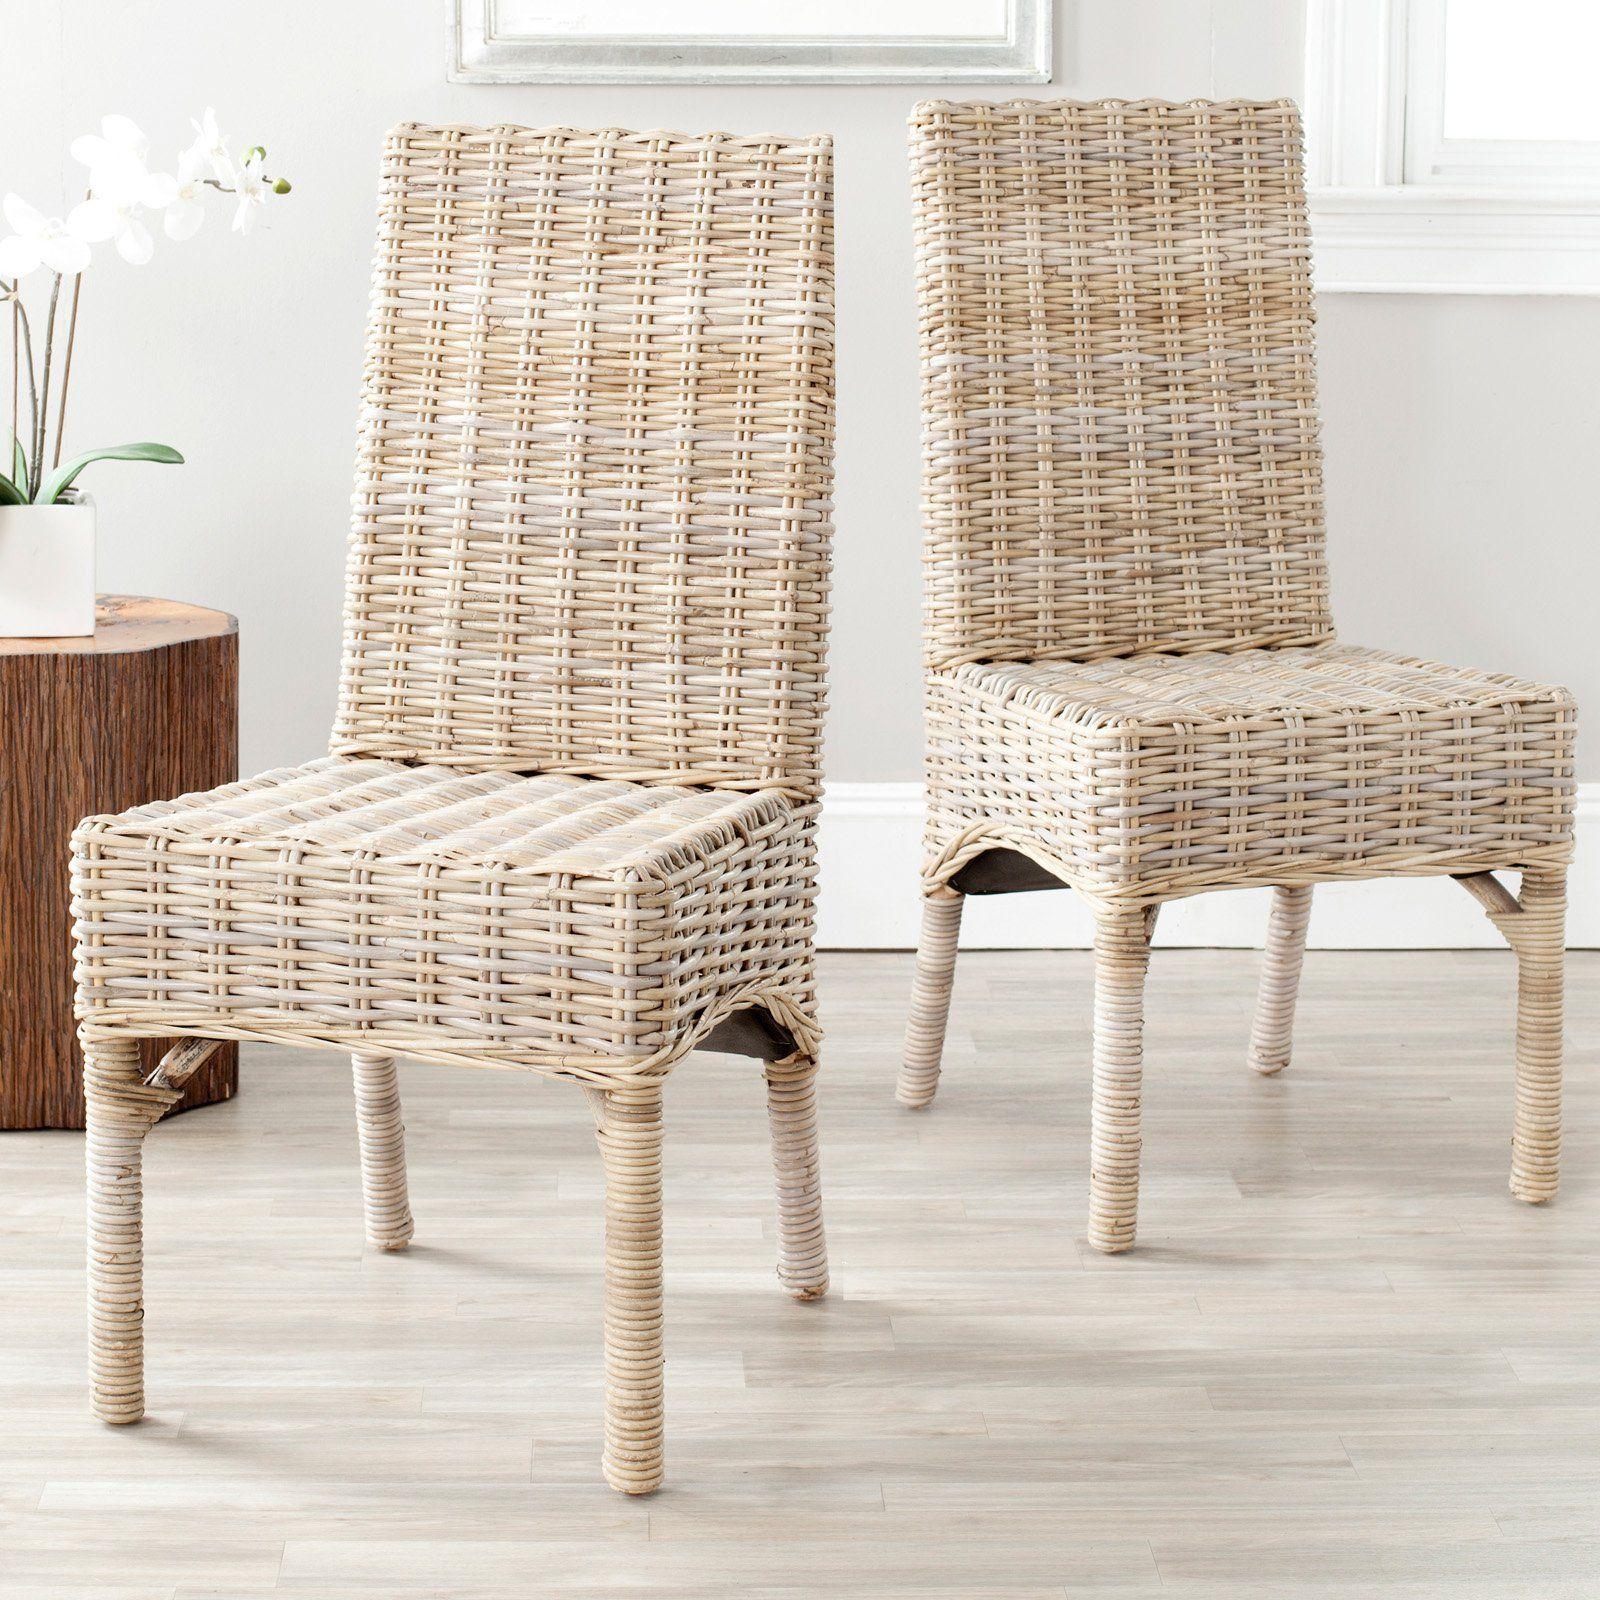 Safavieh Beacon Wicker Dining Side Chairs Set Of 2 Wicker